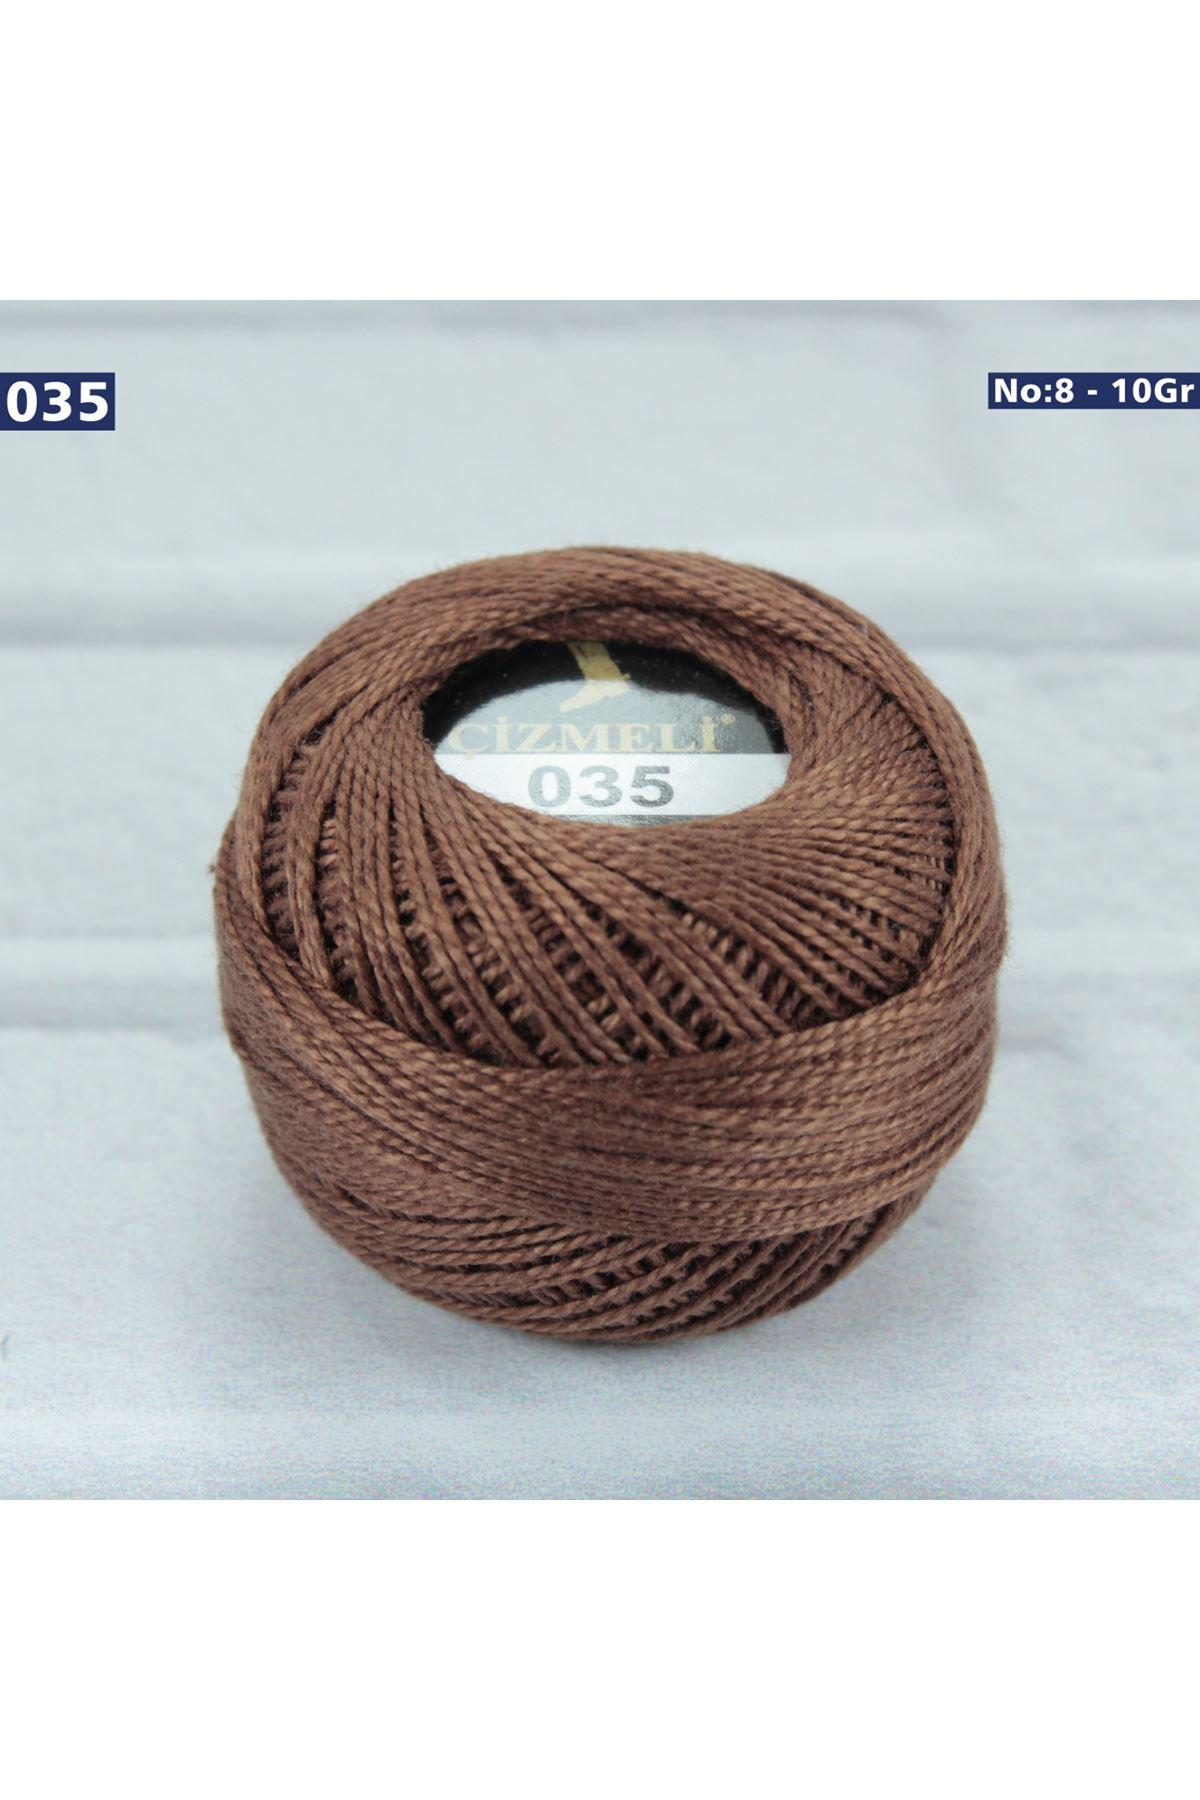 Çizmeli Cotton Perle Nakış İpliği No: 035